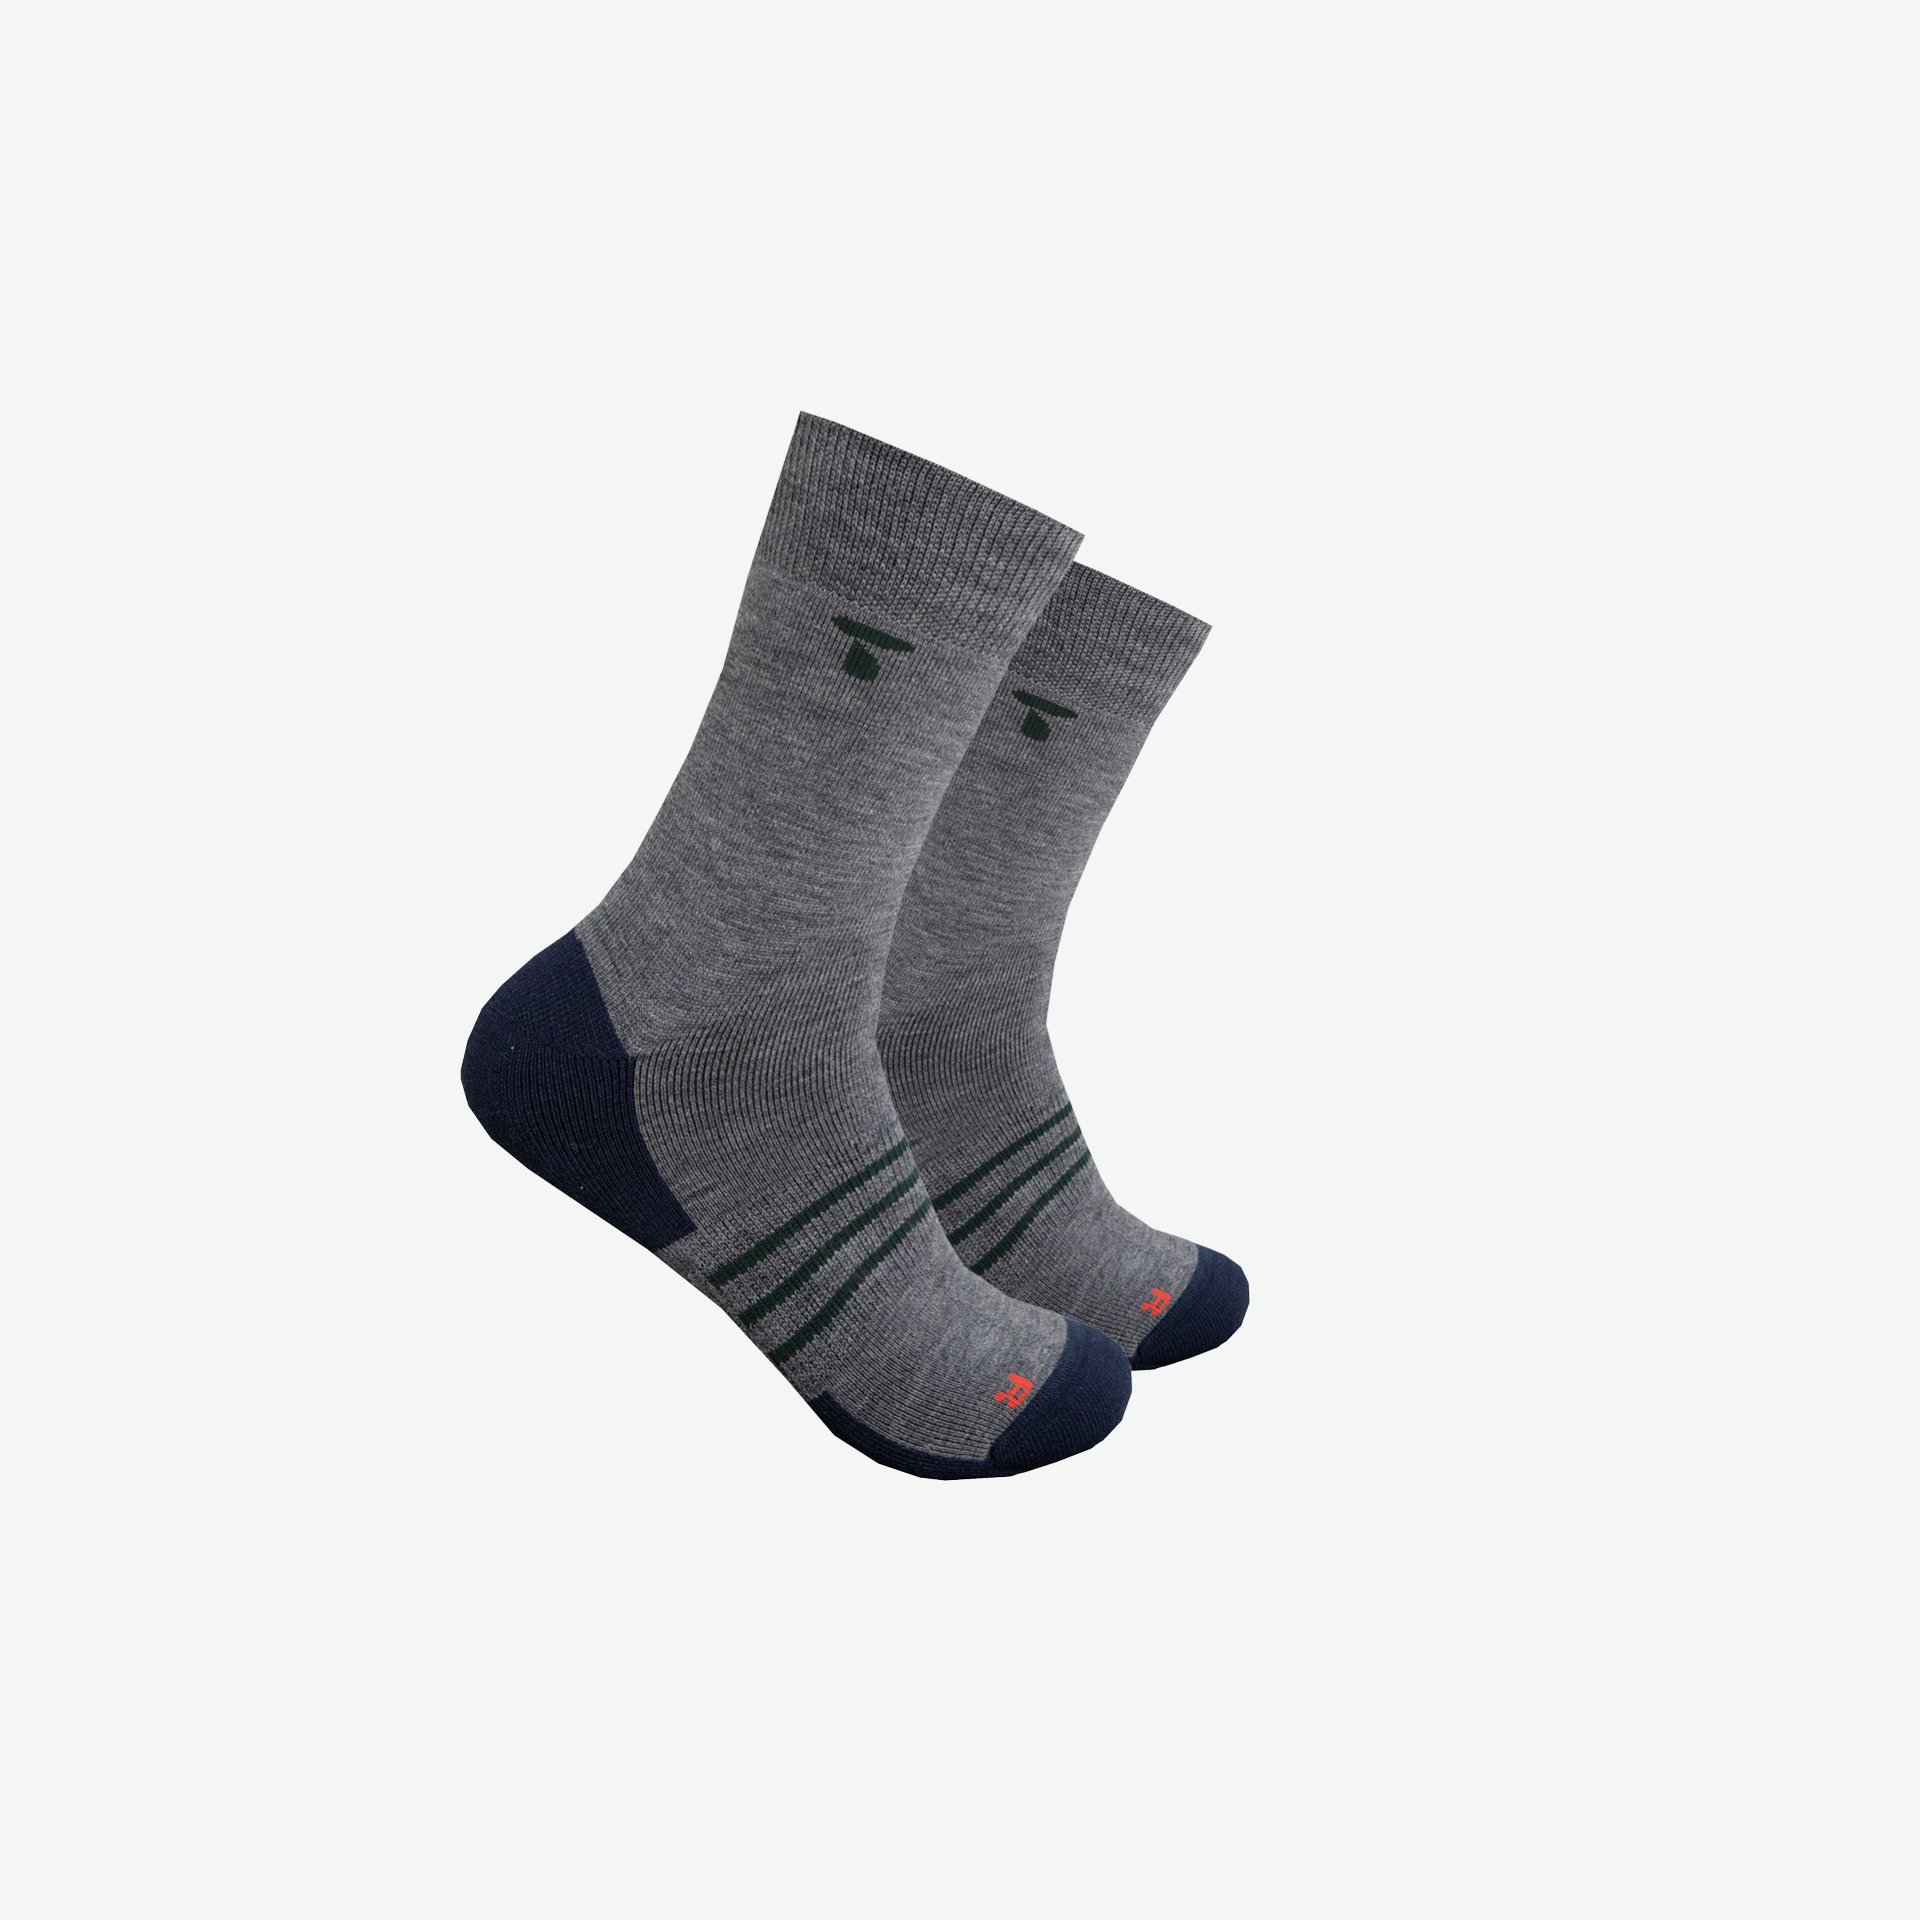 Tufte Unisex Merino Warm Crew Socks